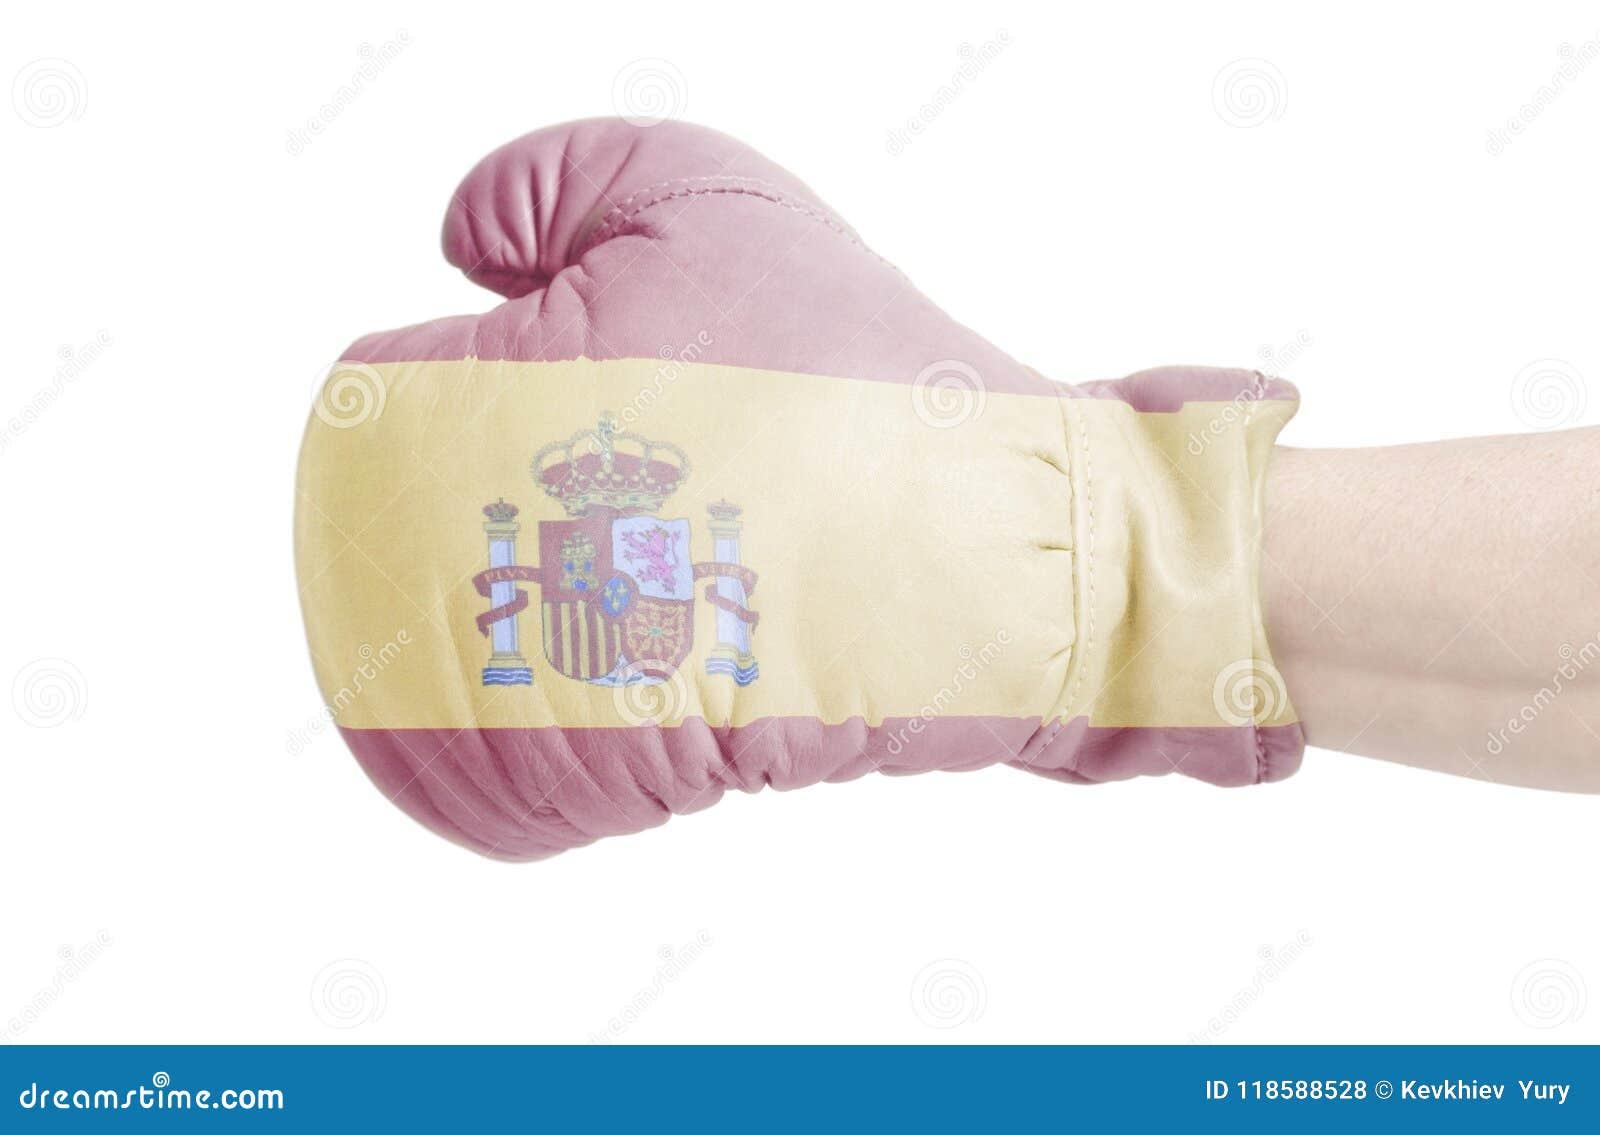 Spain Flag on boxing glove